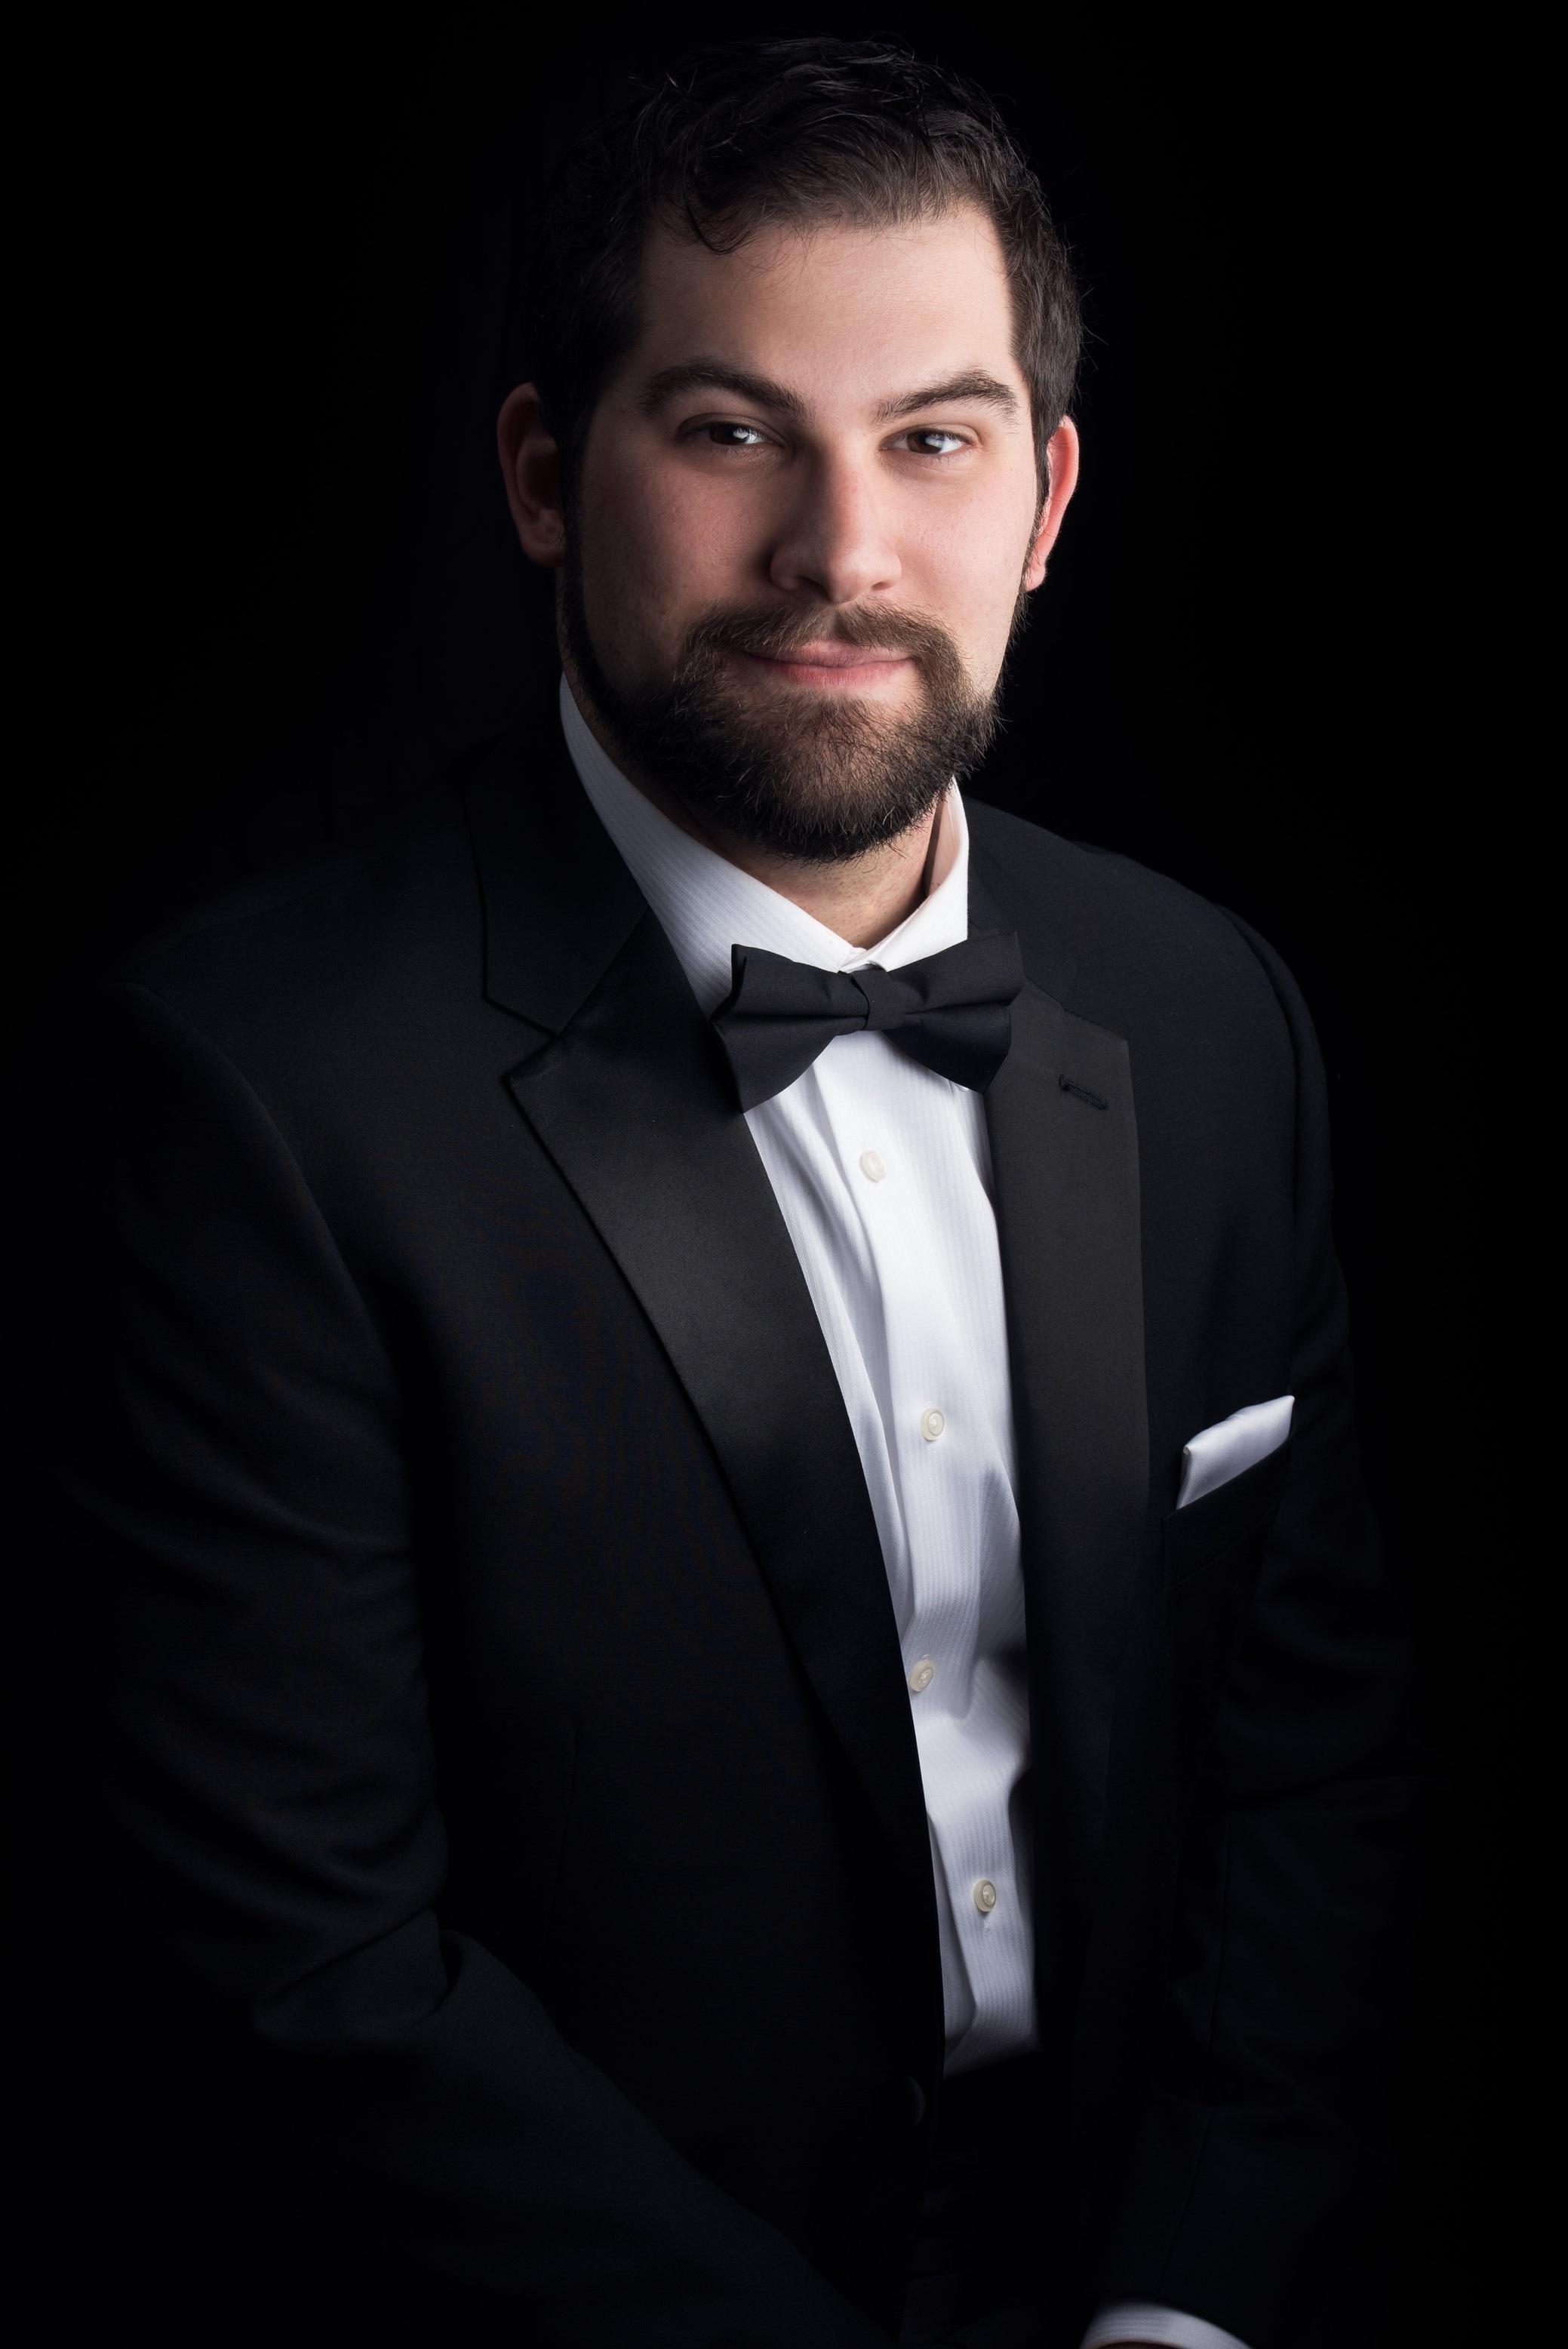 *Marco Cammarota, tenor